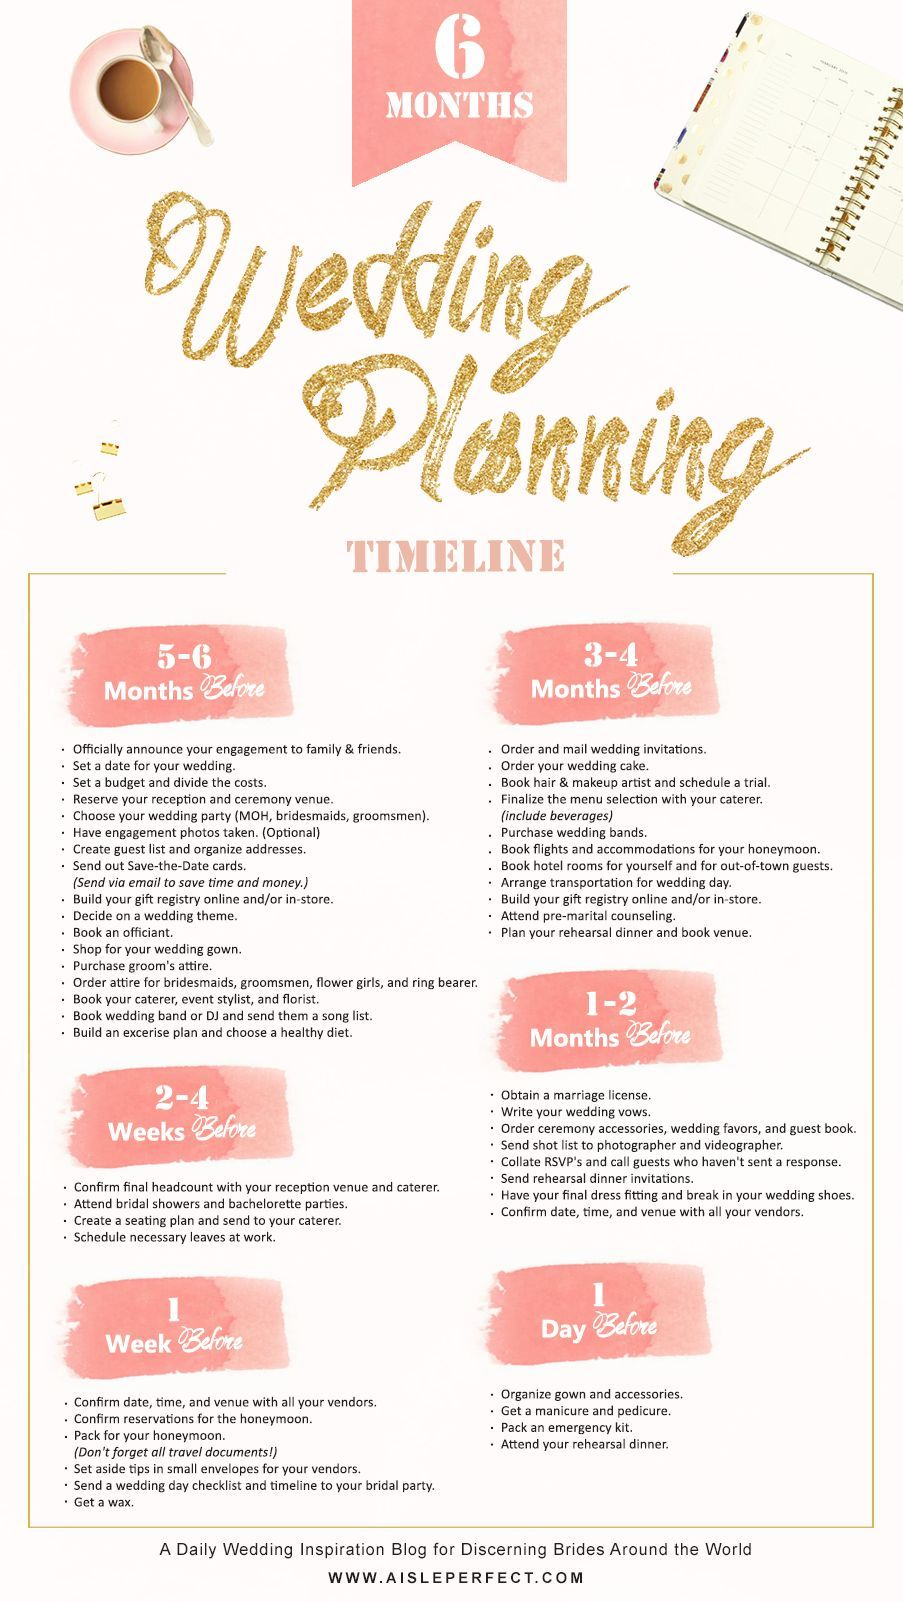 6 Month Wedding Planning Best Photos Cuteweddingideas